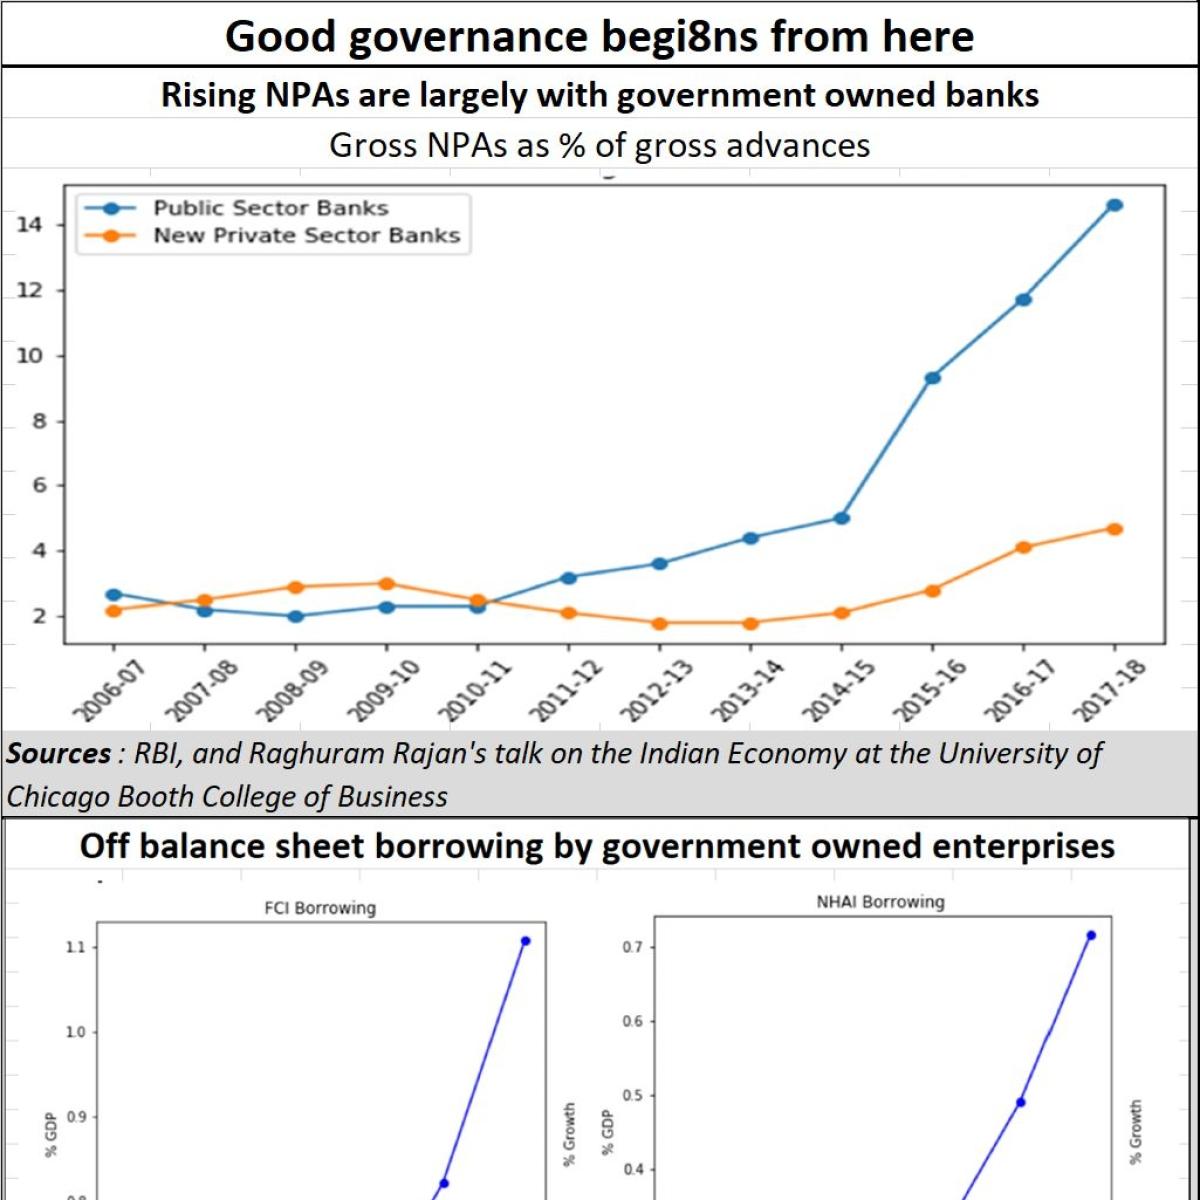 Good governance begins at home itself